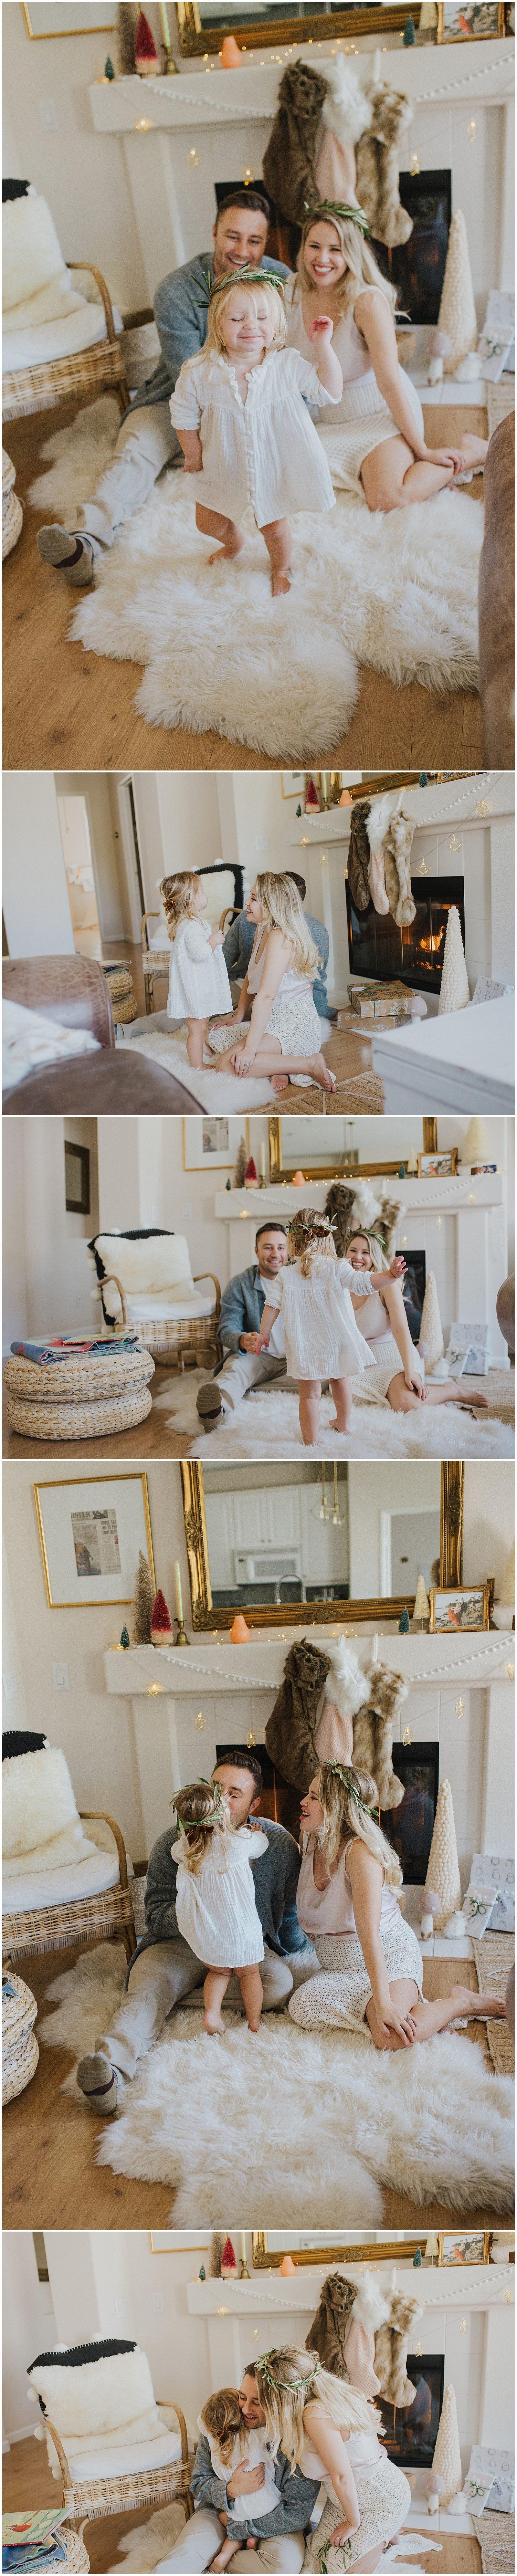 Orange County Family Lifestyle Photographer Sonja Hammad Photography 0123